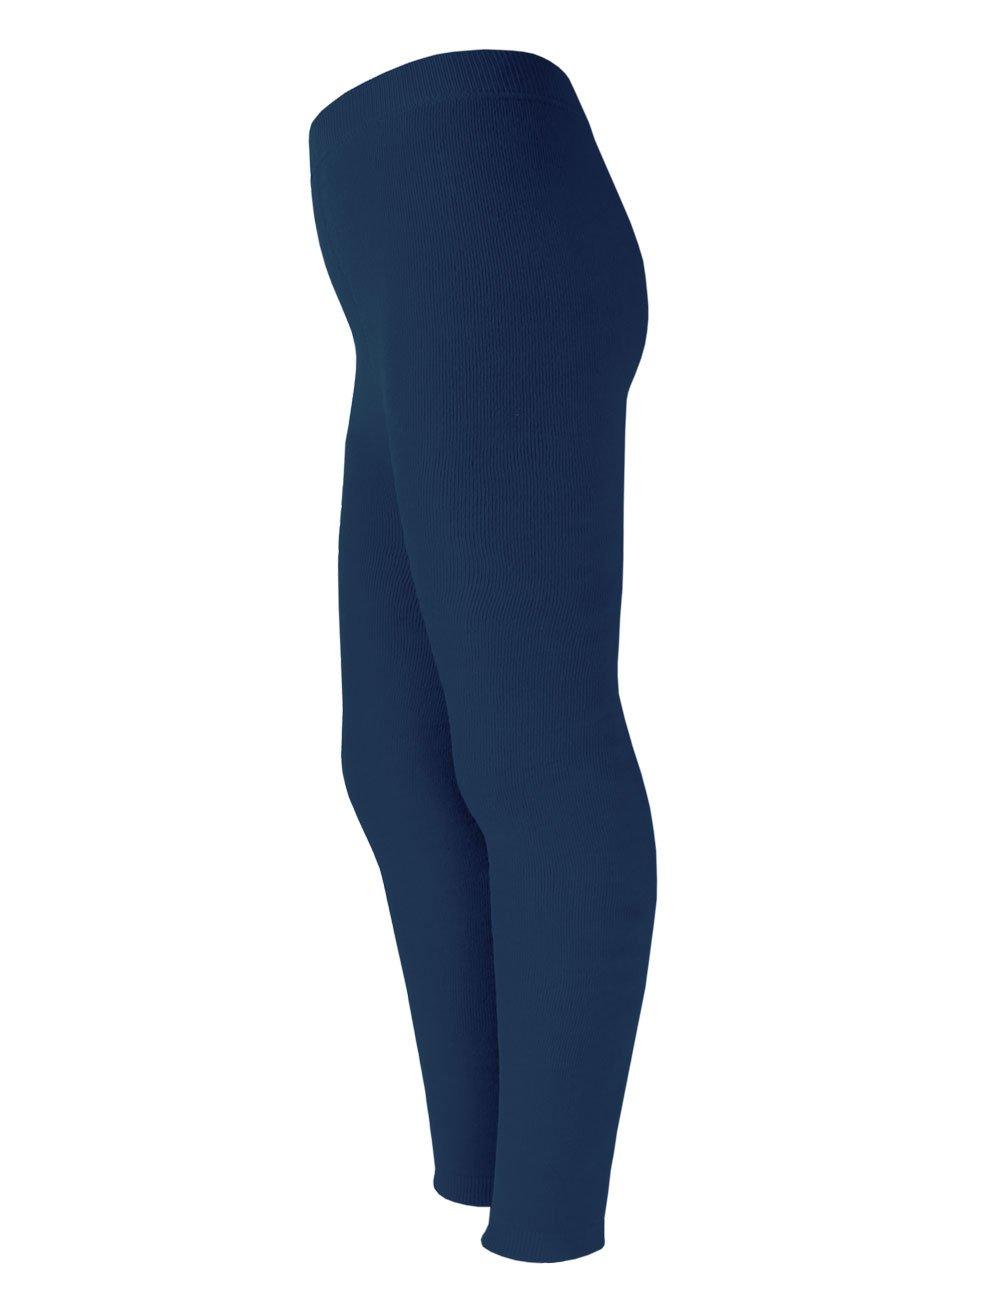 MaxiMo Vollfrotteeleggings, Einfarbig, Calzamaglia sportiva Bambino Blau (indigo 4) 53243-161900_4